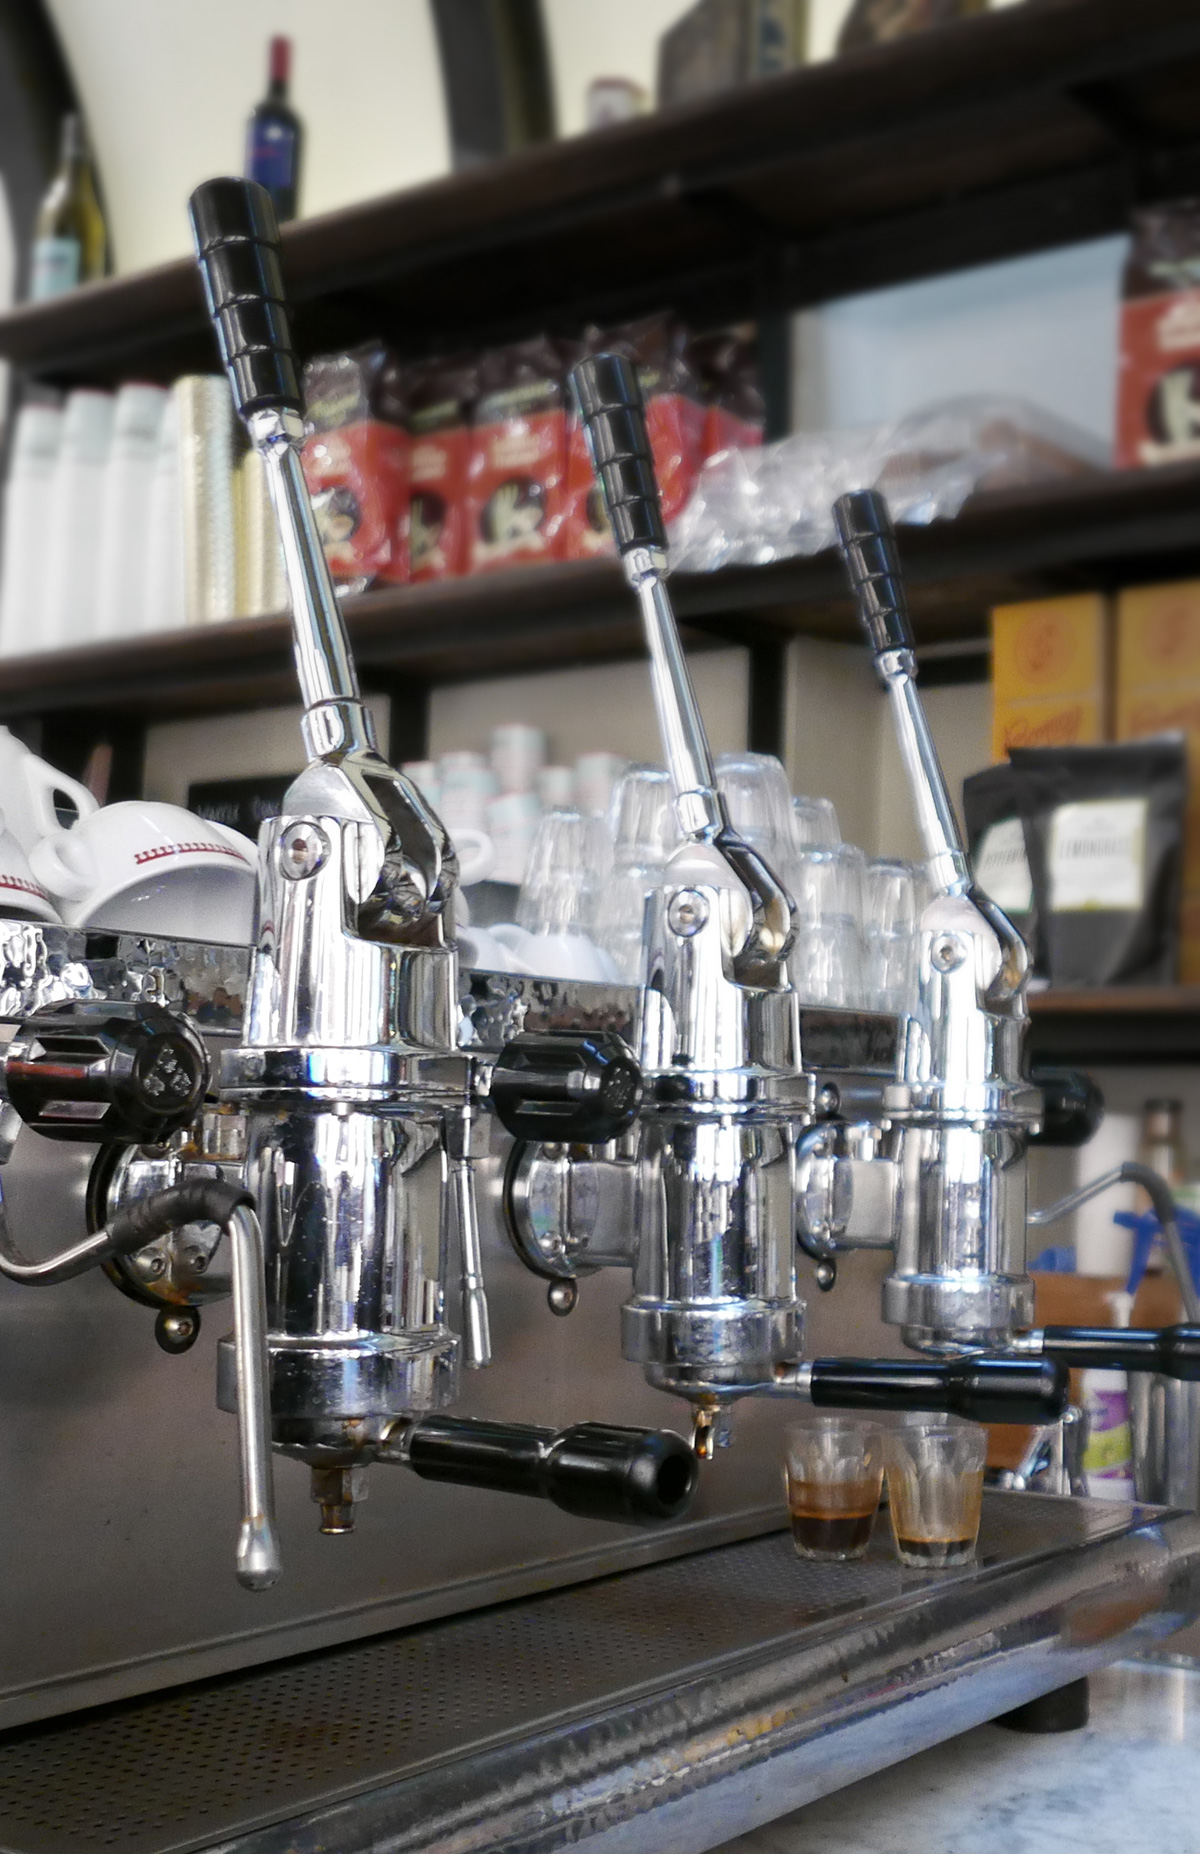 Barbarella-coffee-press-2.jpg